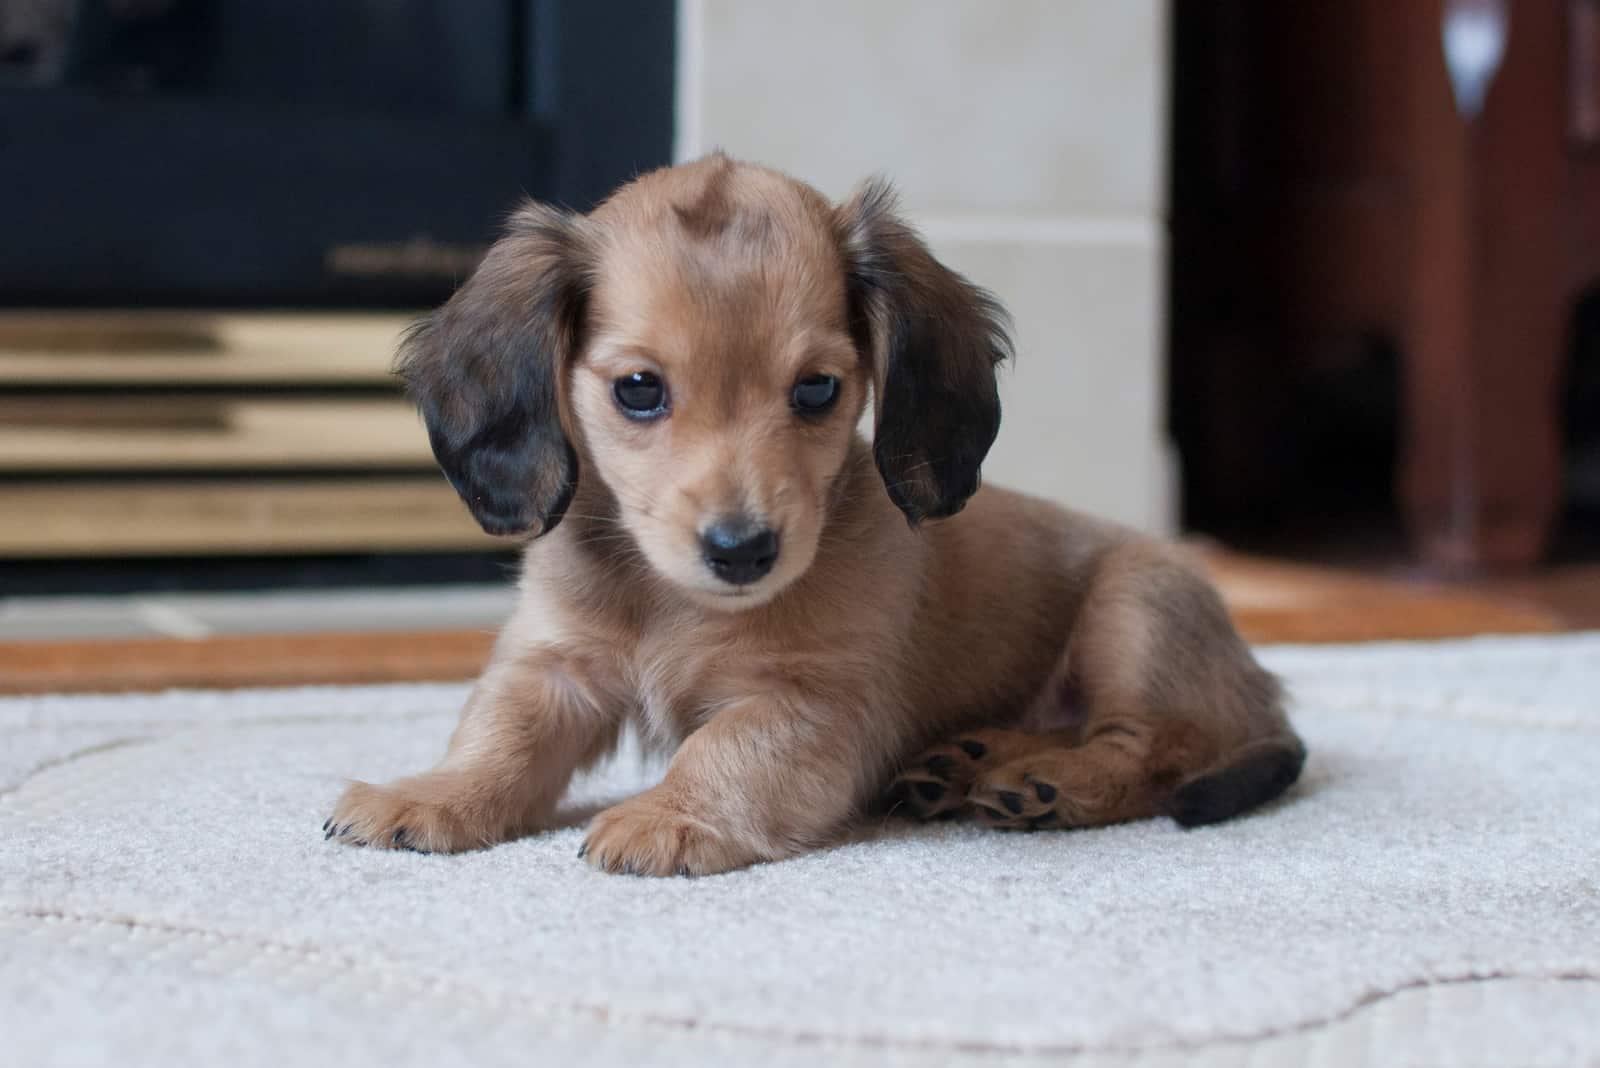 Shaded English Cream Miniature Dachshund Puppy Sitting